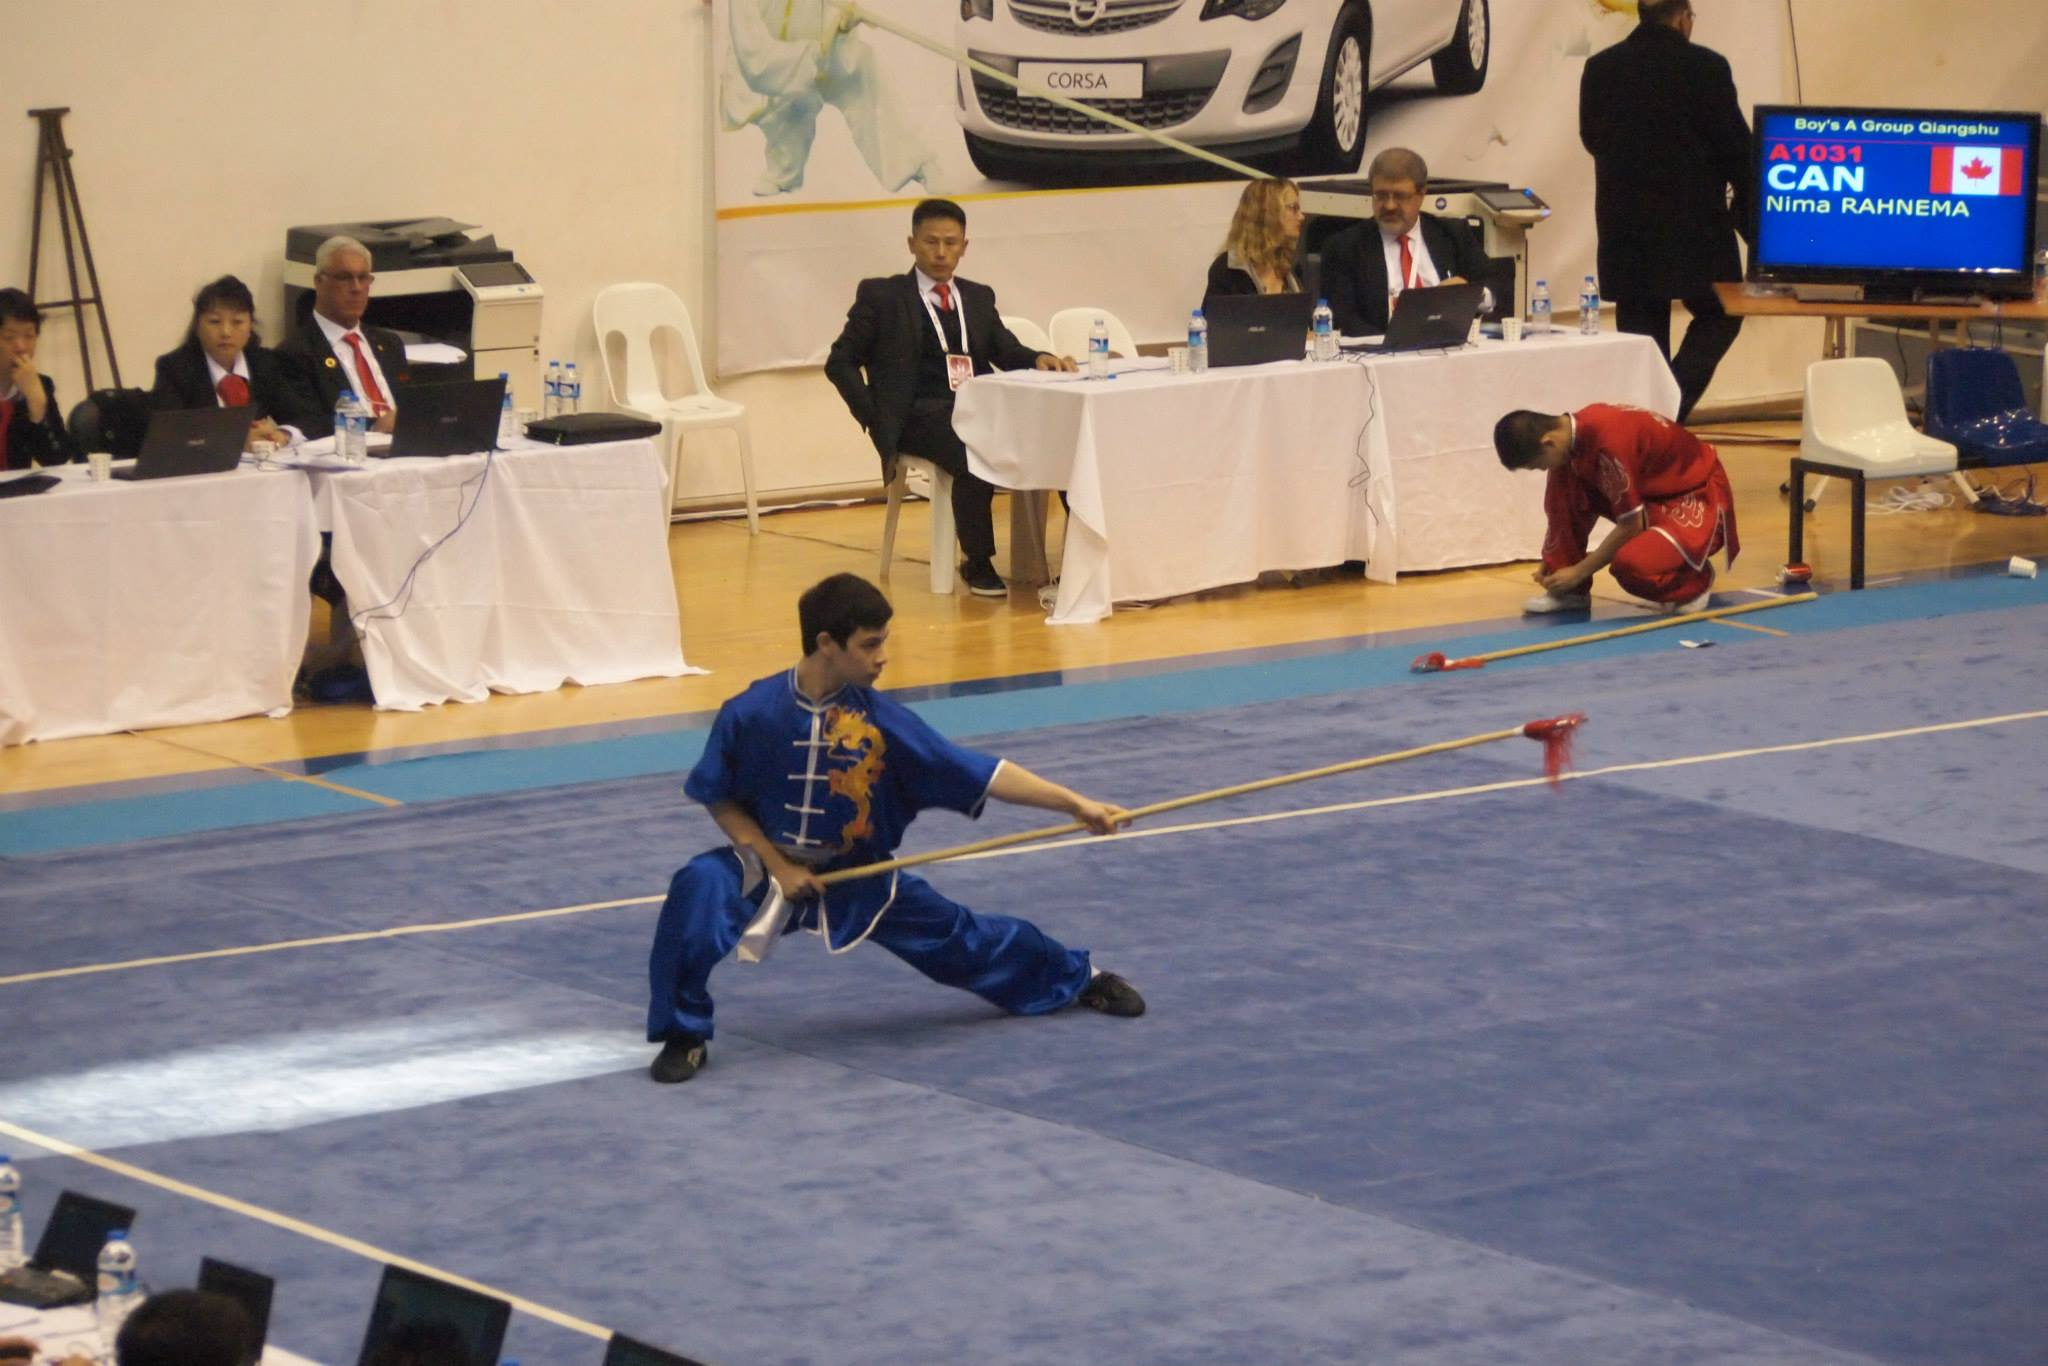 Wayland_Li_Wushu_World_Junior_Championships_2014_Turkey_Nima_2.jpg